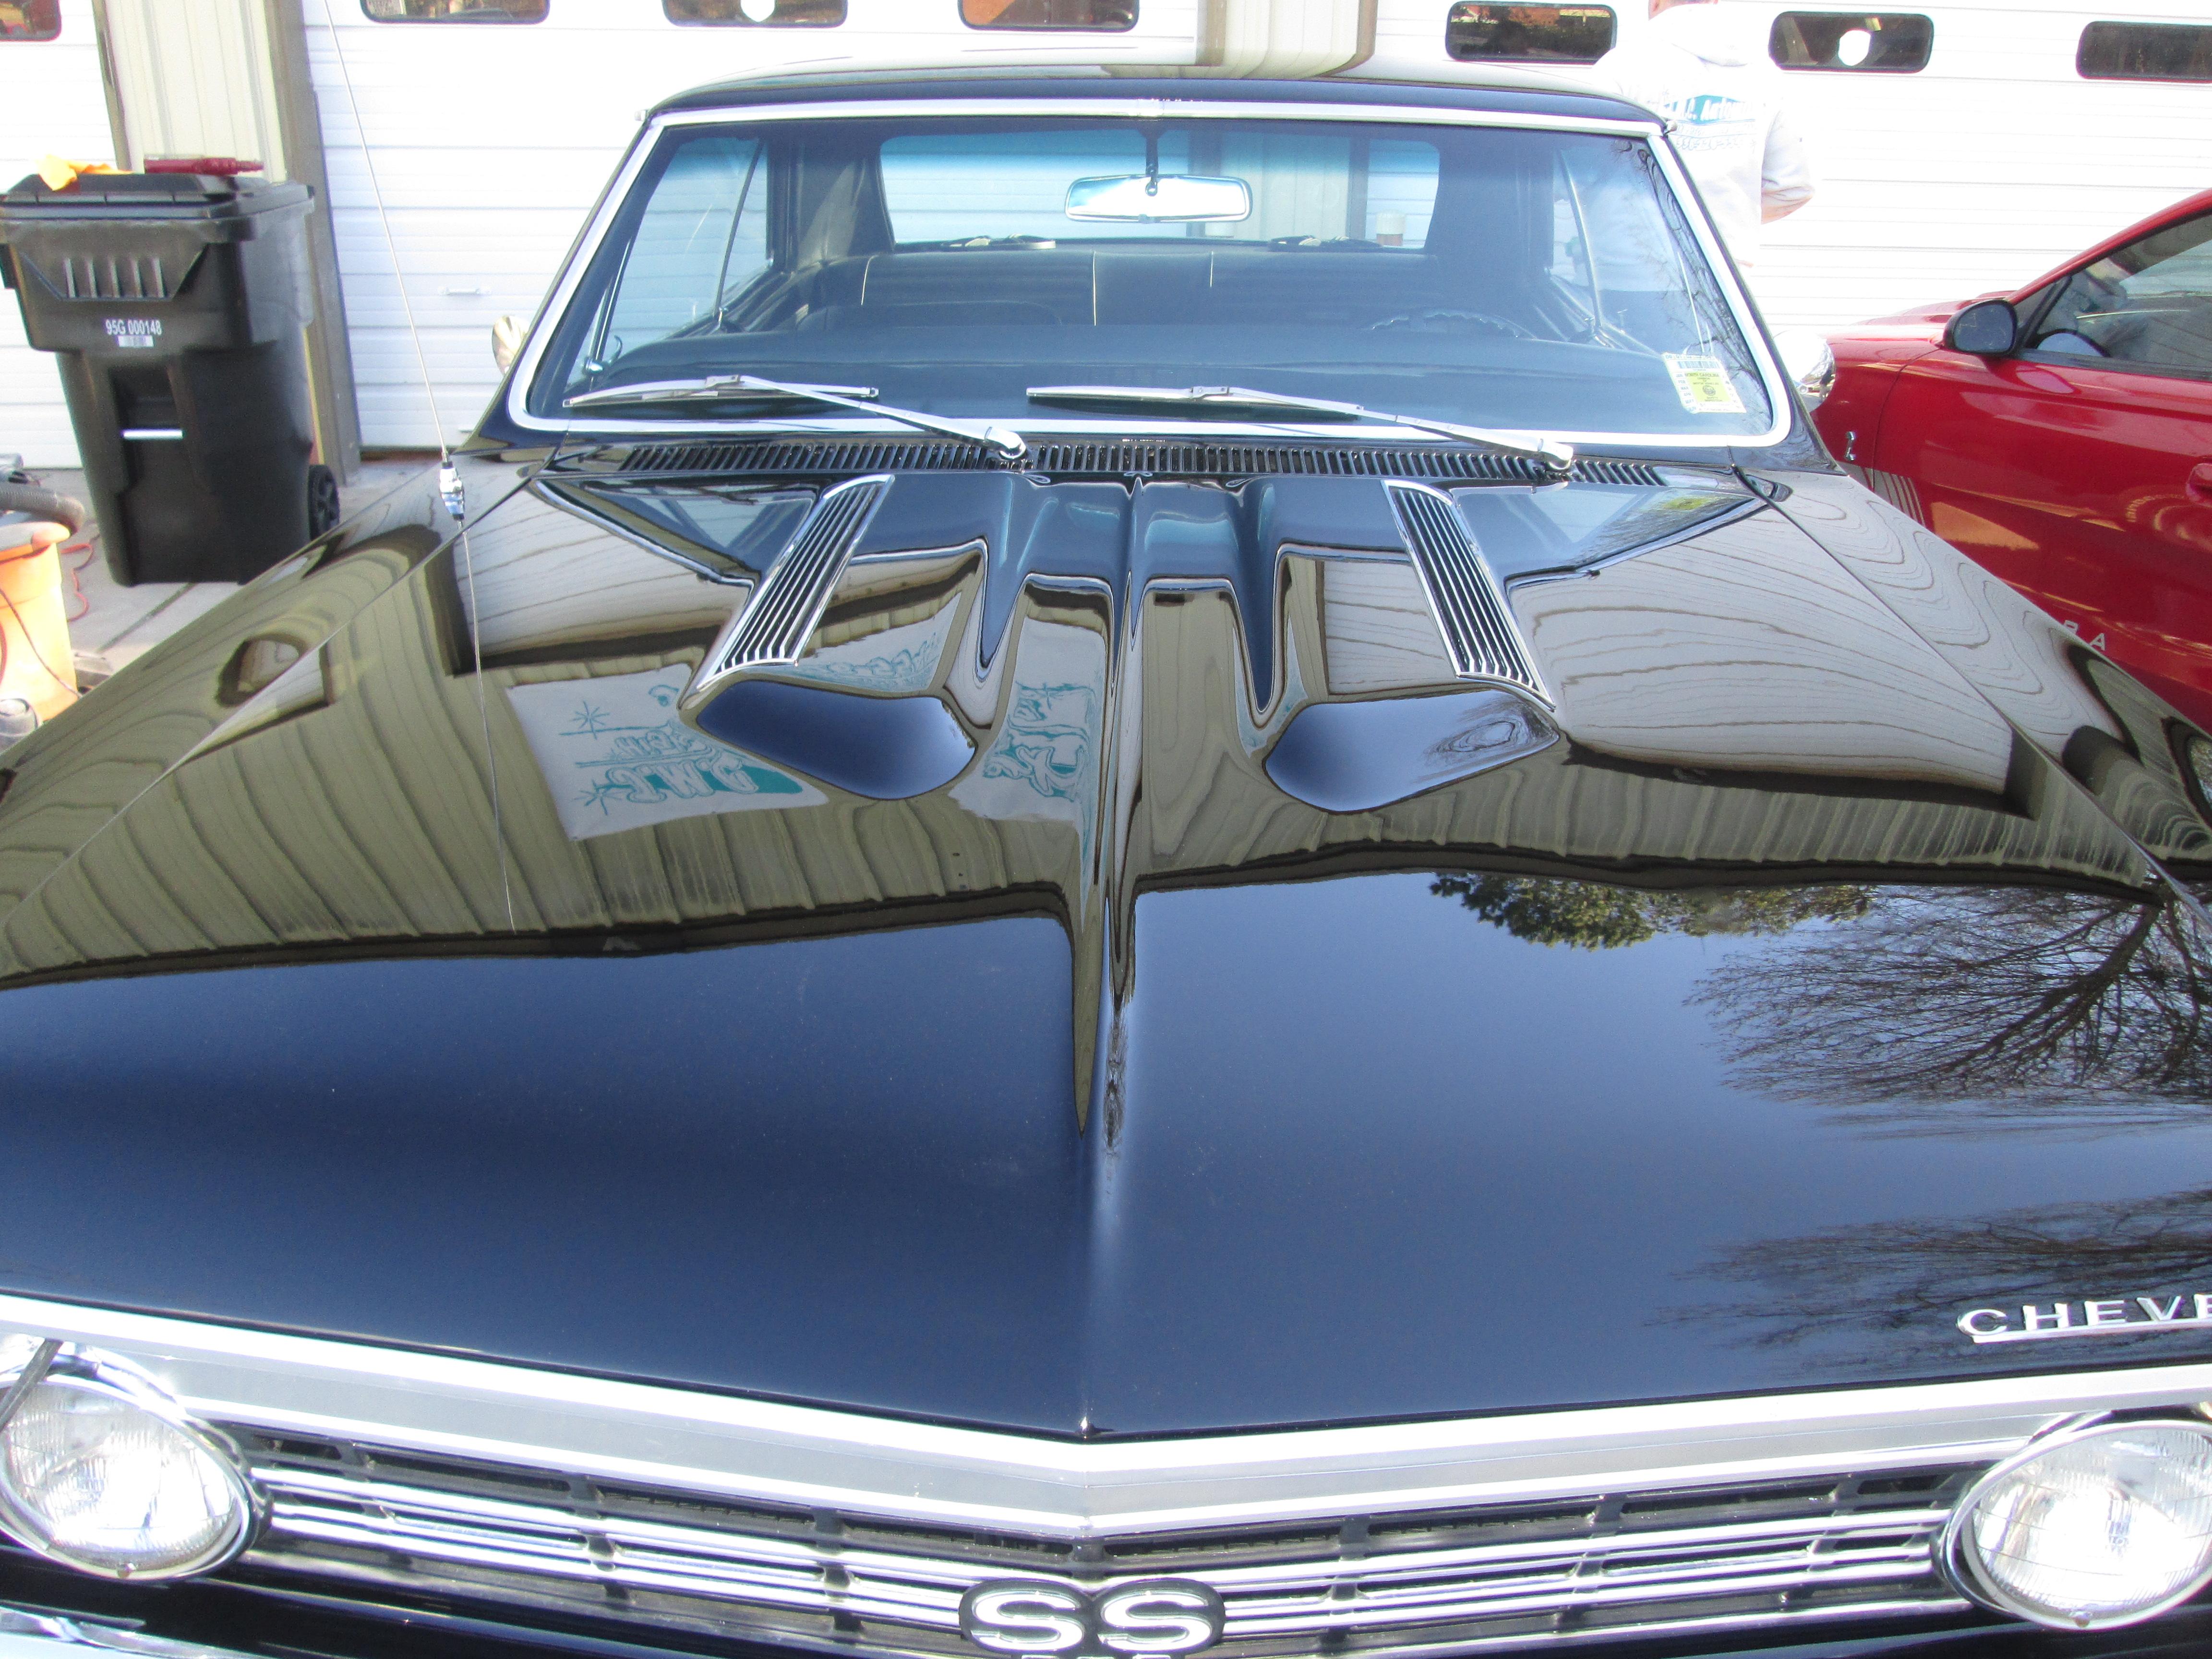 1967 Chevrolet Chevelle Ss 2012 Jmc Autoworx Chevy Hello I Have A 64 That Ive 201230104 3